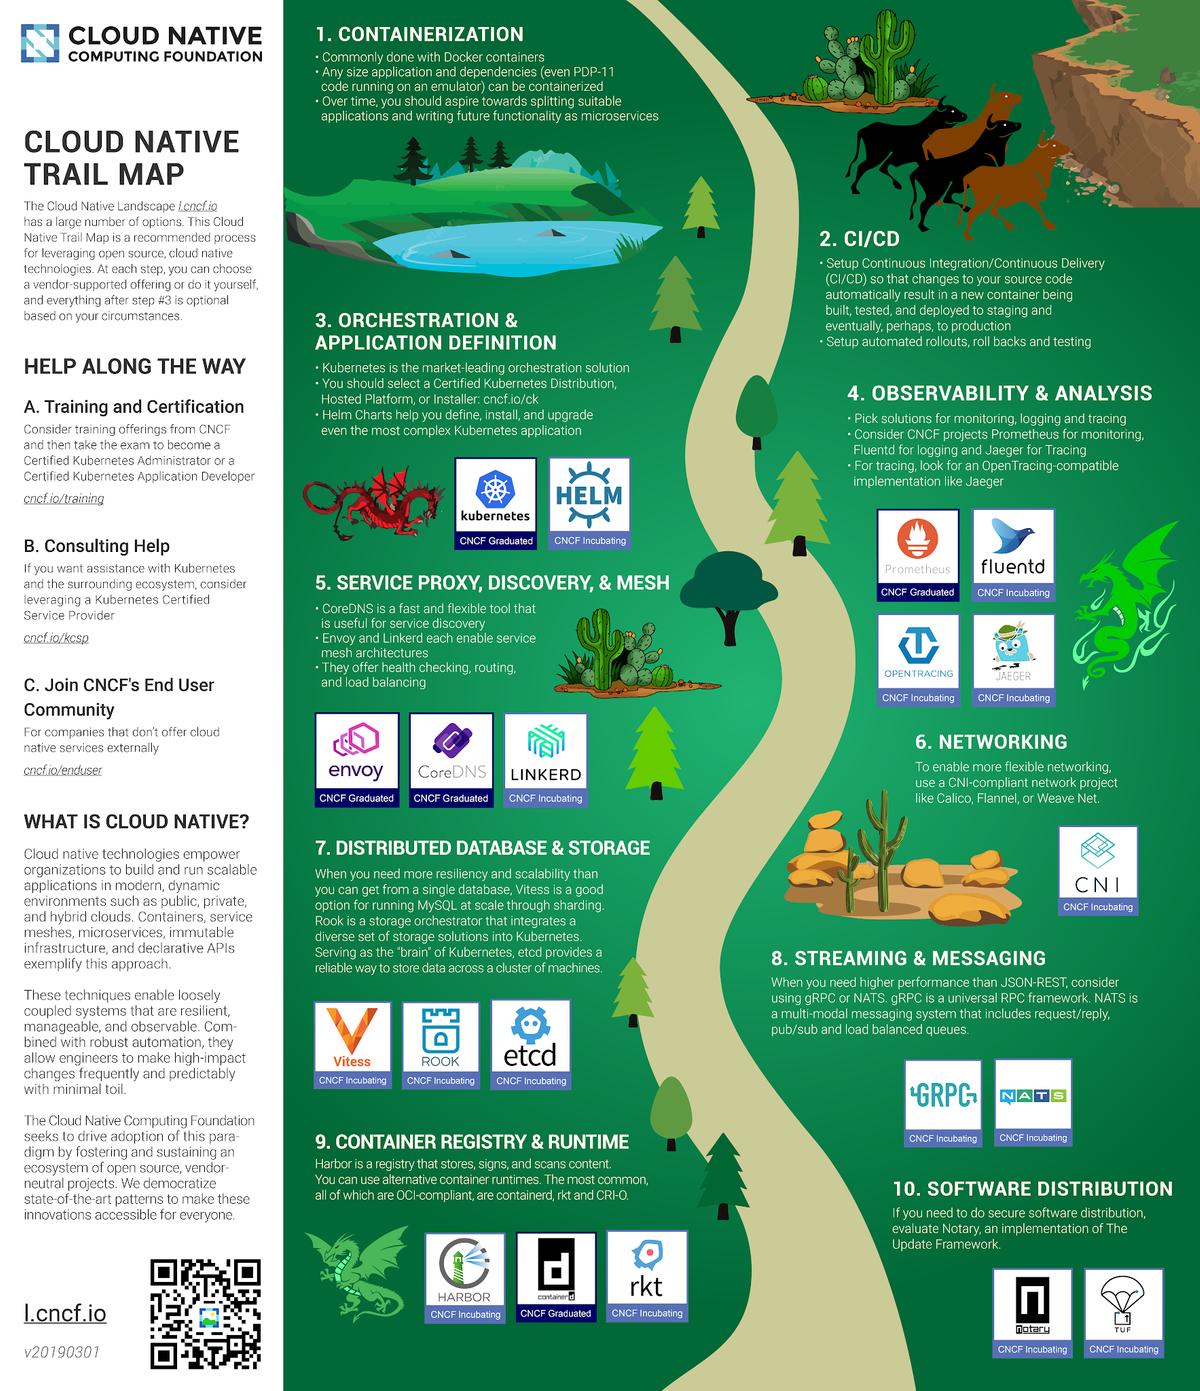 Cloud Native Trail Map